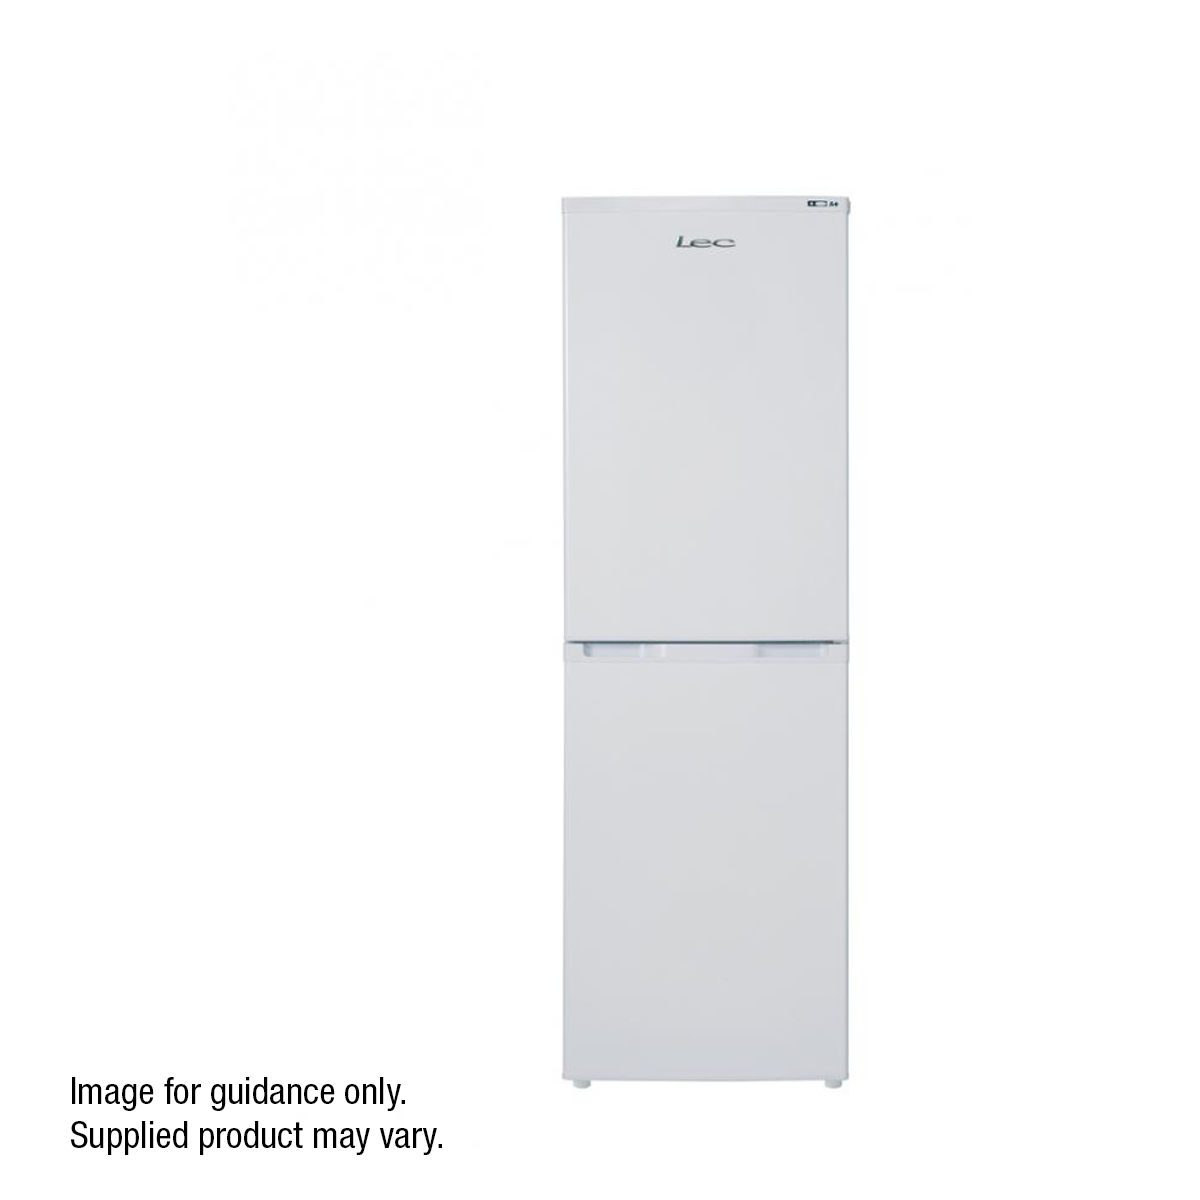 REFURBISHED Basic Tall Fridge Freezer